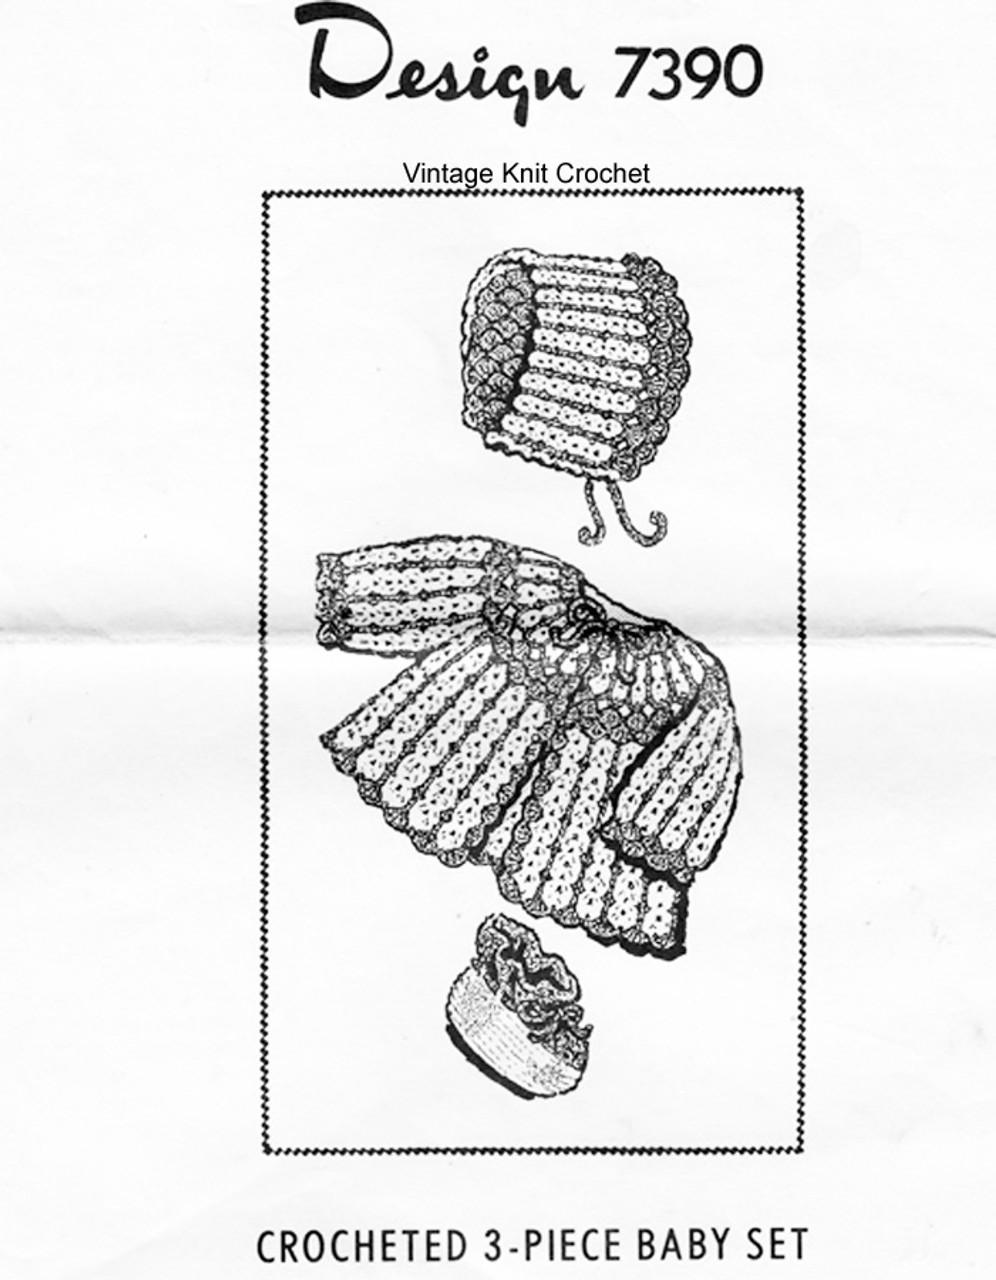 Crochet Baby Set Pattern, Shell Stitch, Mail Order 7390